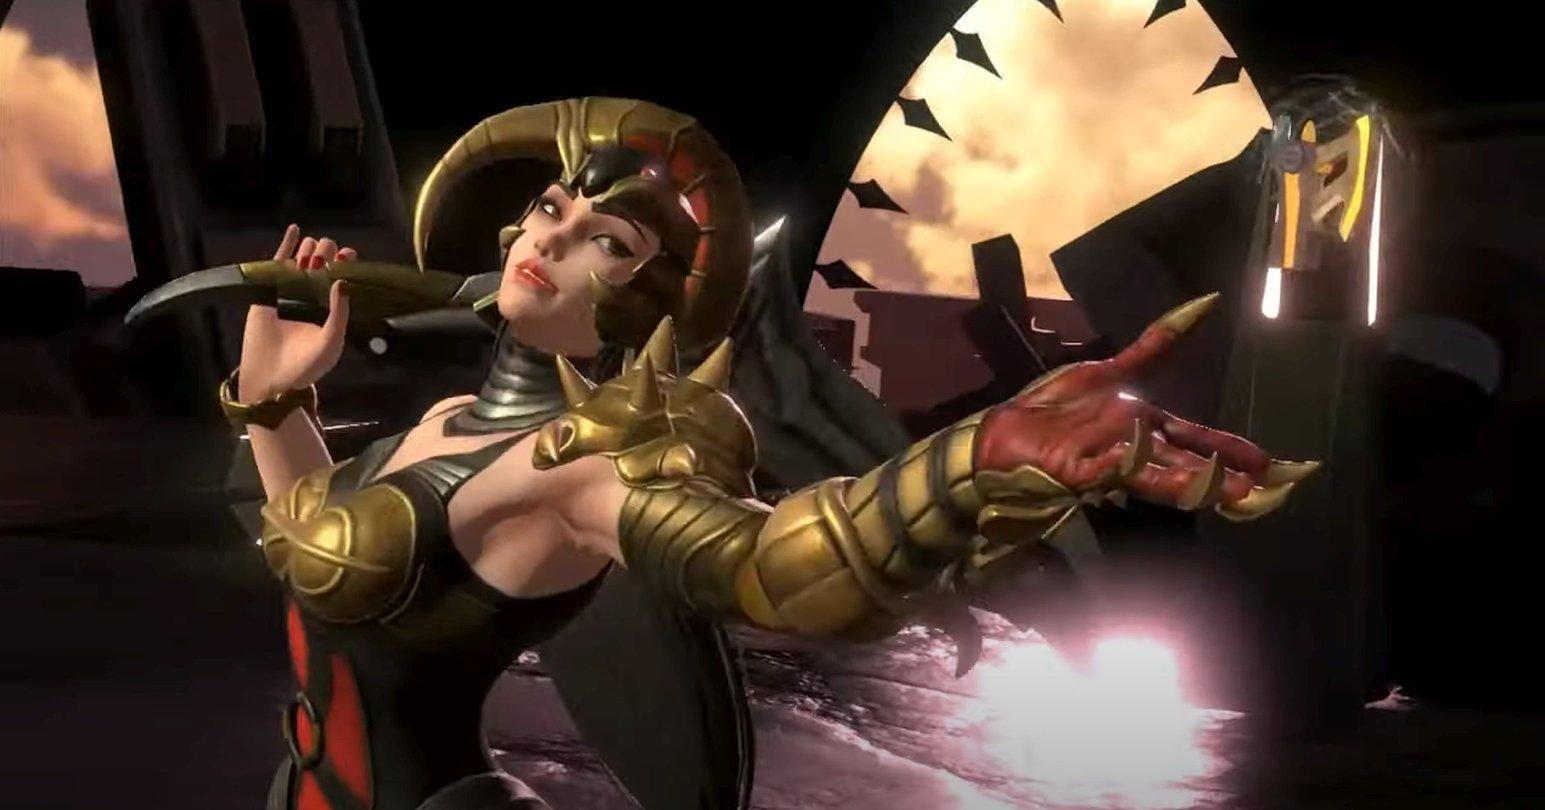 Power Rangers: Battle for the Grid Announces Scorpina As Final Season 3 Pass DLC Character